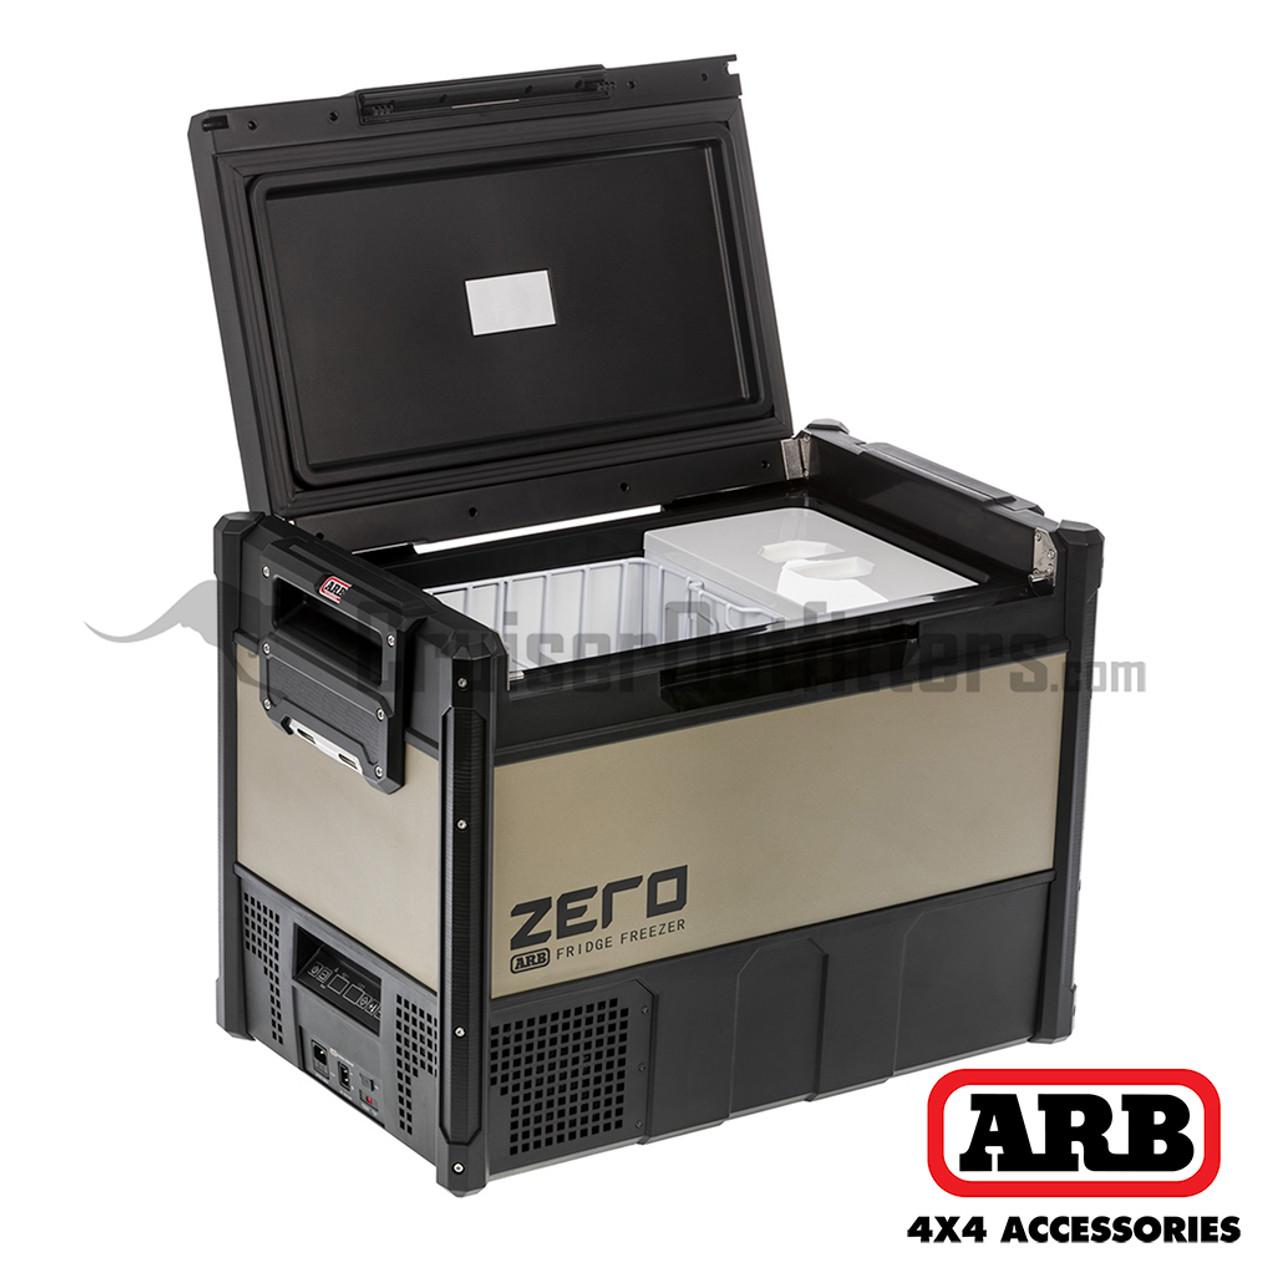 ARB Zero Fridge Freezer SIngle Zone - 63 QT (ARB10802602)